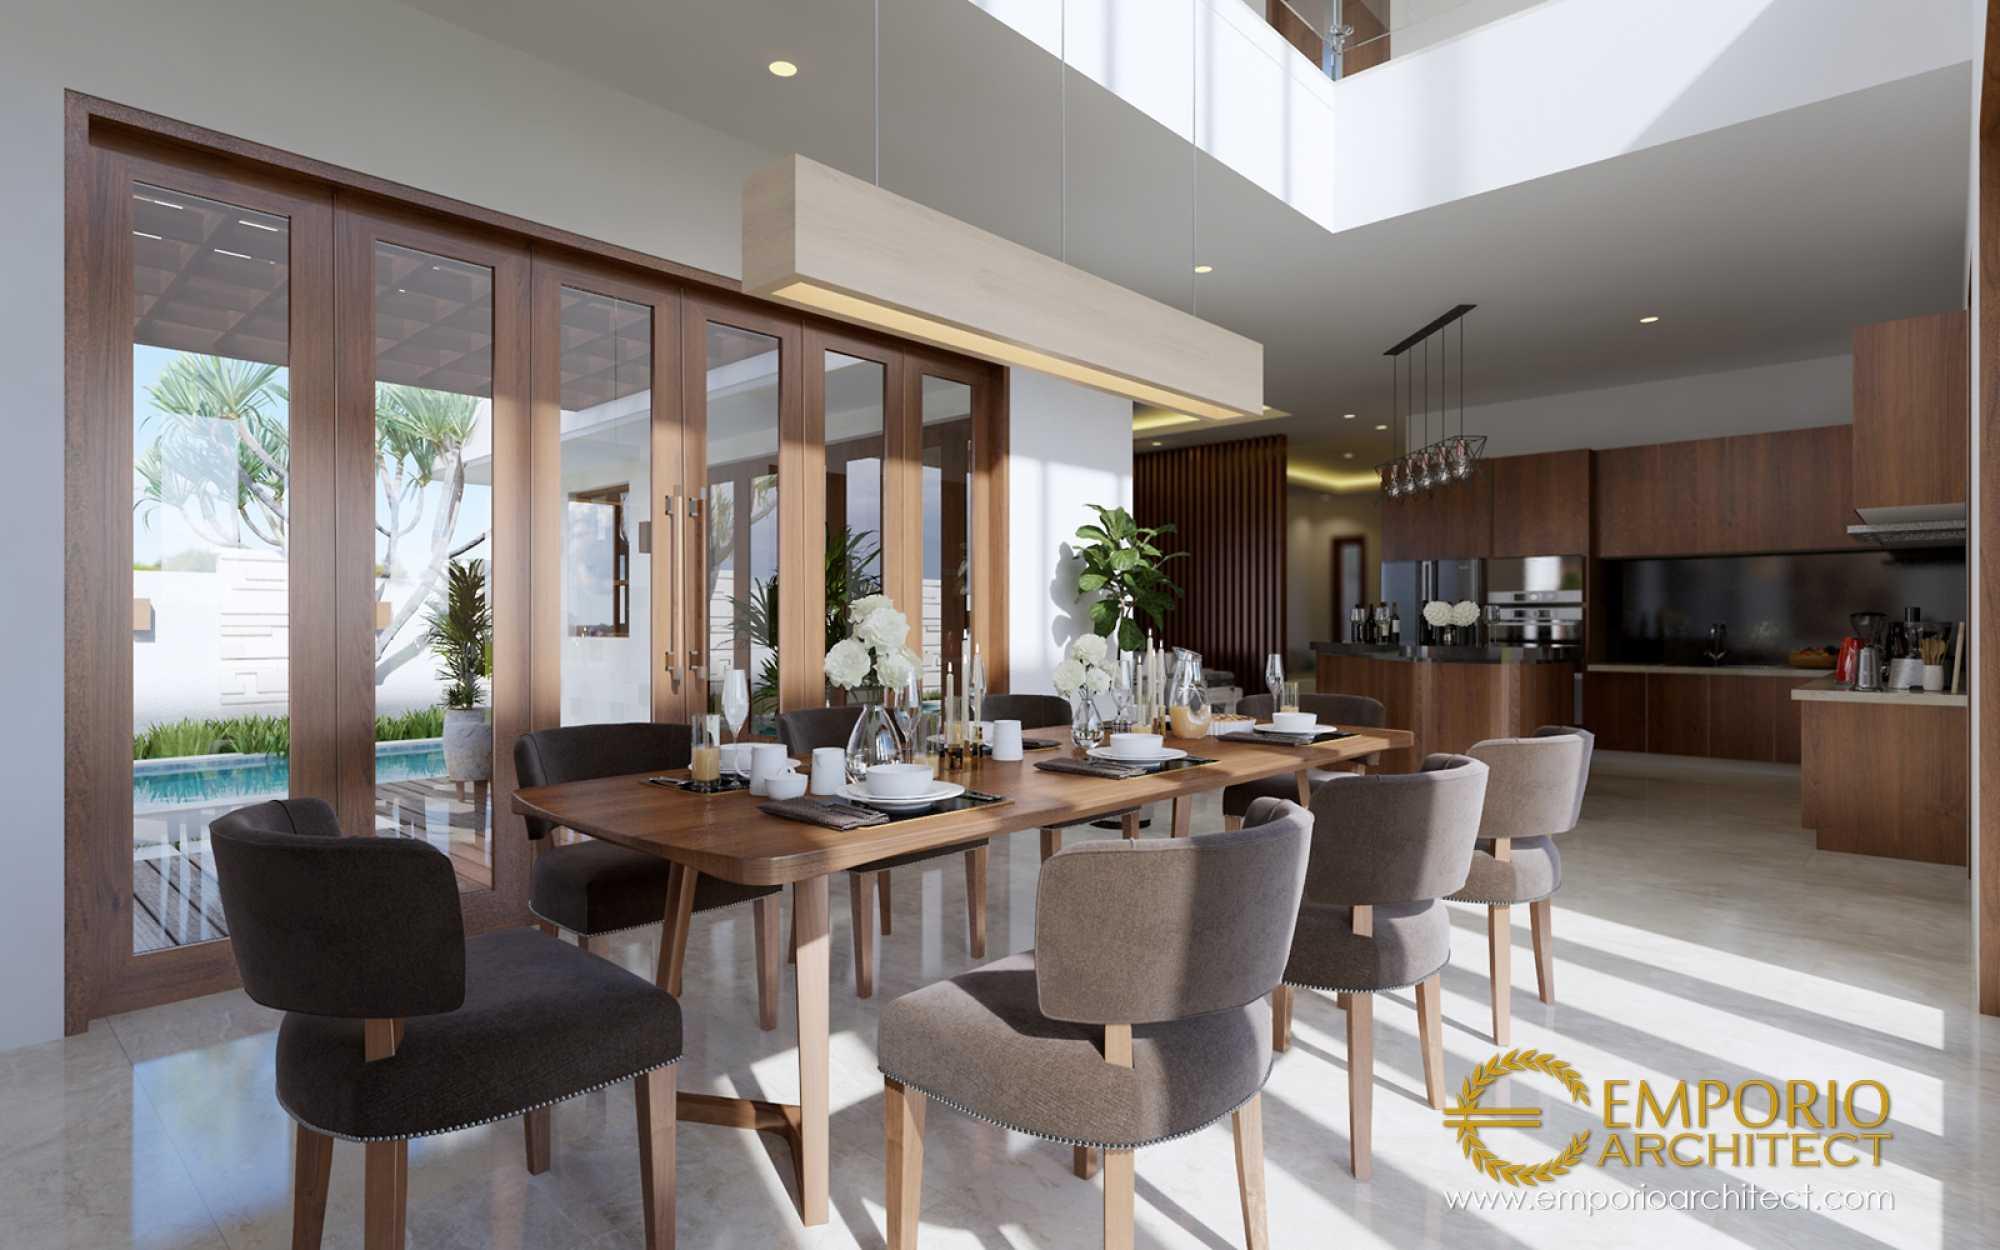 Emporio Architect Desain Rumah Villa Bali Tropis 381 @ Jawa Tengah Jawa Tengah, Indonesia Jawa Tengah, Indonesia Emporio-Architect-Desain-Rumah-Villa-Bali-Tropis-381-Jawa-Tengah  76578